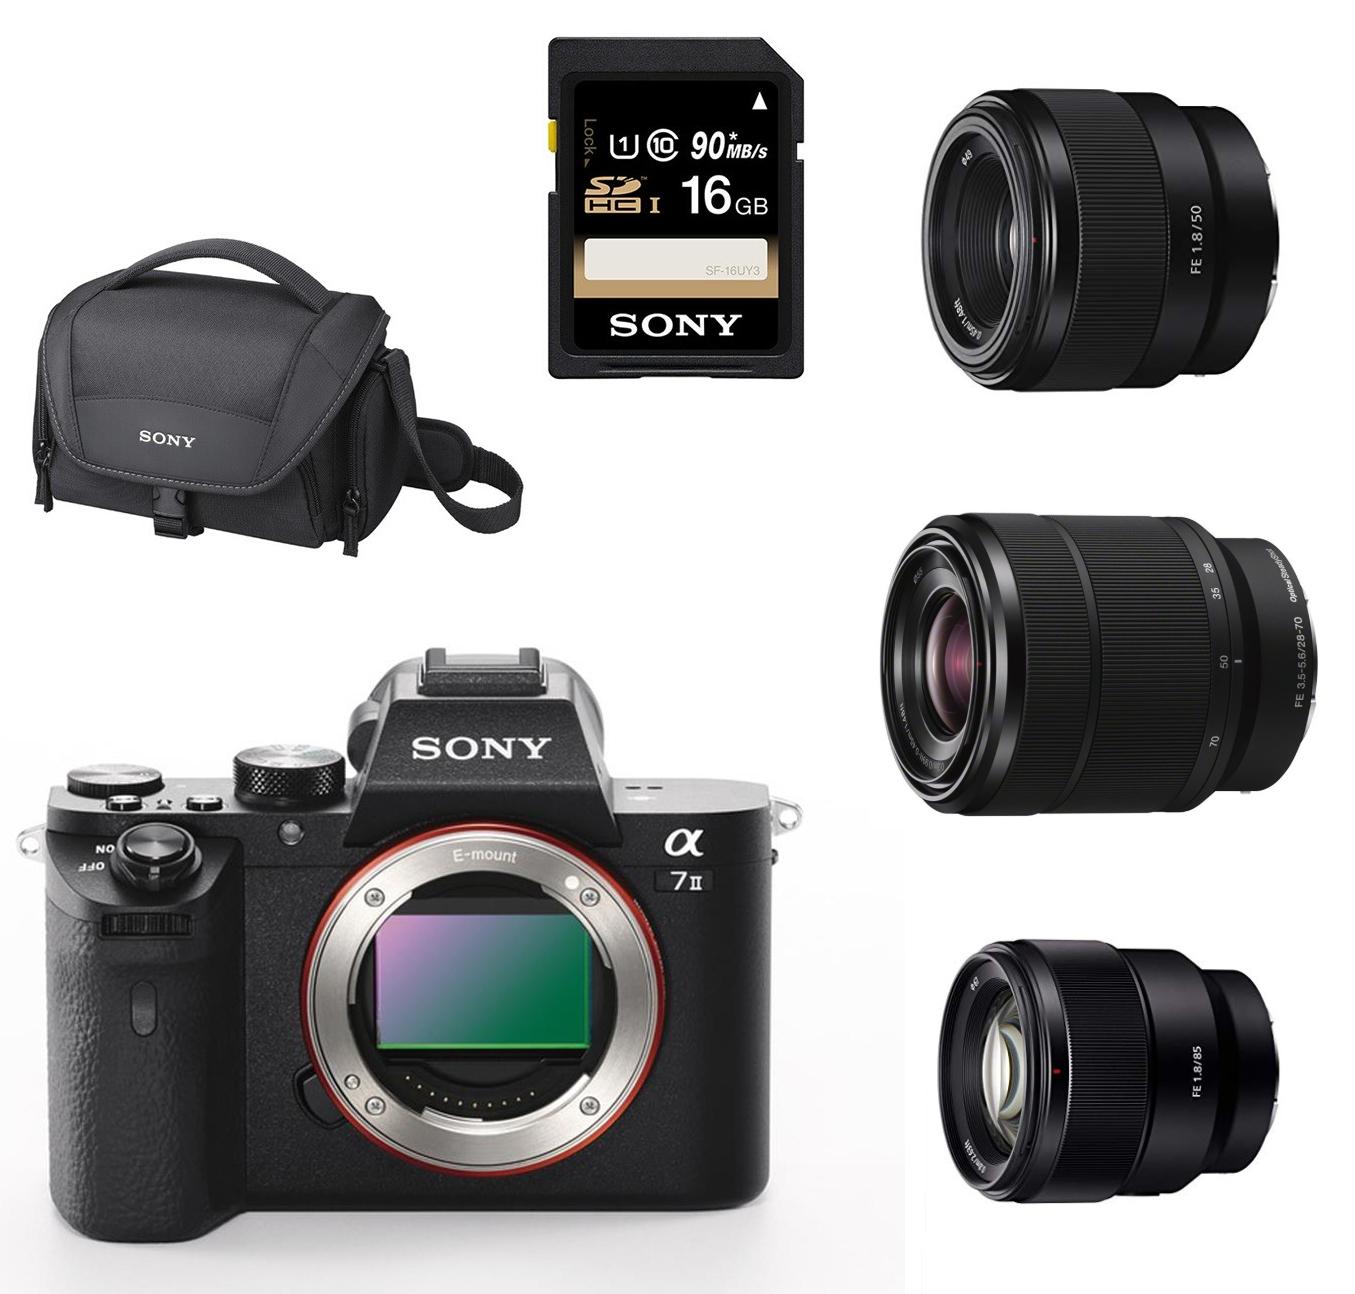 Appareil photo Hybride Sony Alpha A7 II + 3 Objectifs (28-70 mm f/3.5-5.6 + 50 mm f/1.8 + 85 mm f/1.8) + Sacoche + Carte SD 16 Go